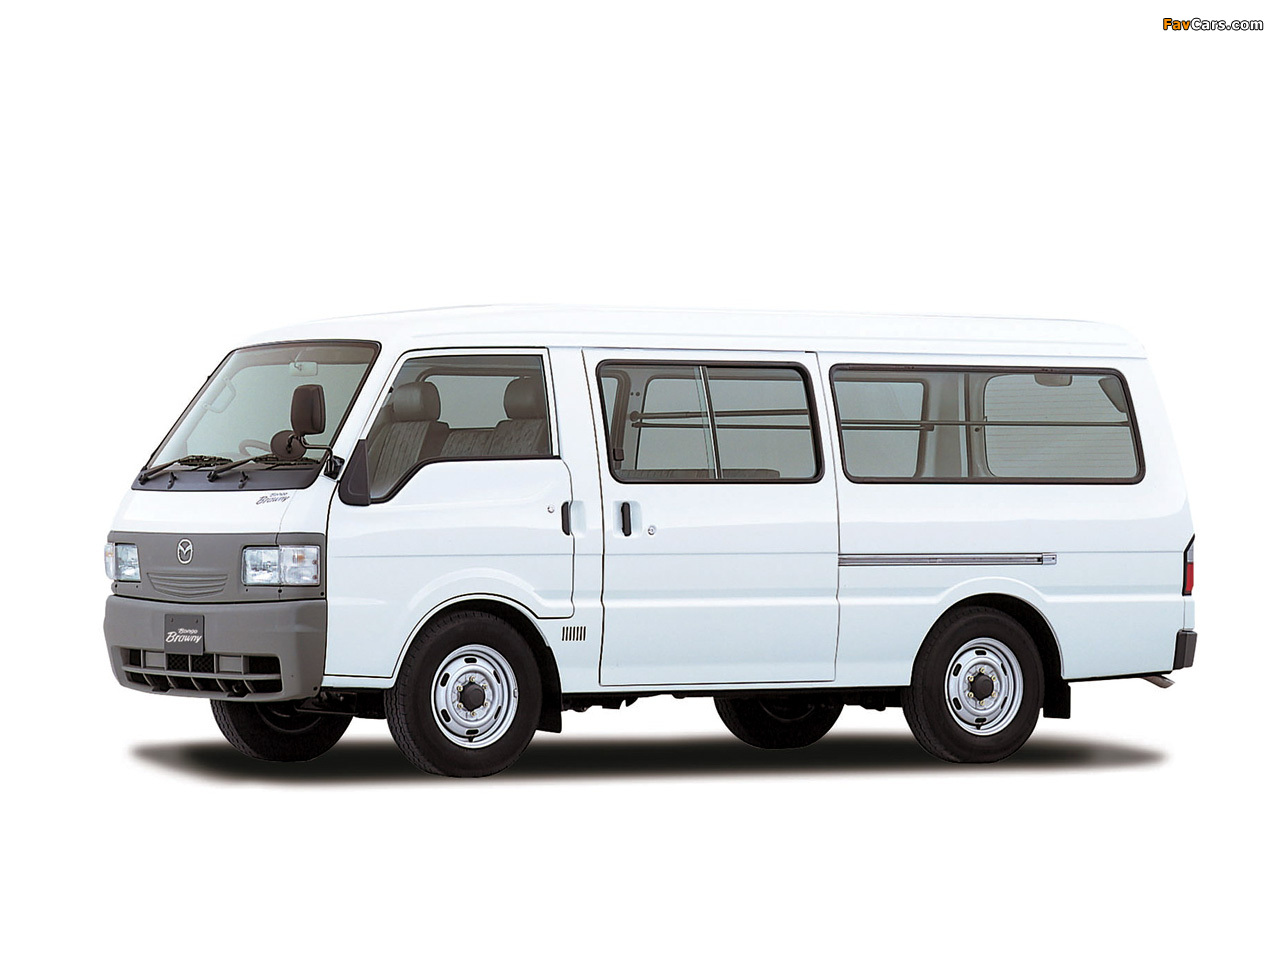 Mazda Bongo Brawny Van 2002 images (1280x960)